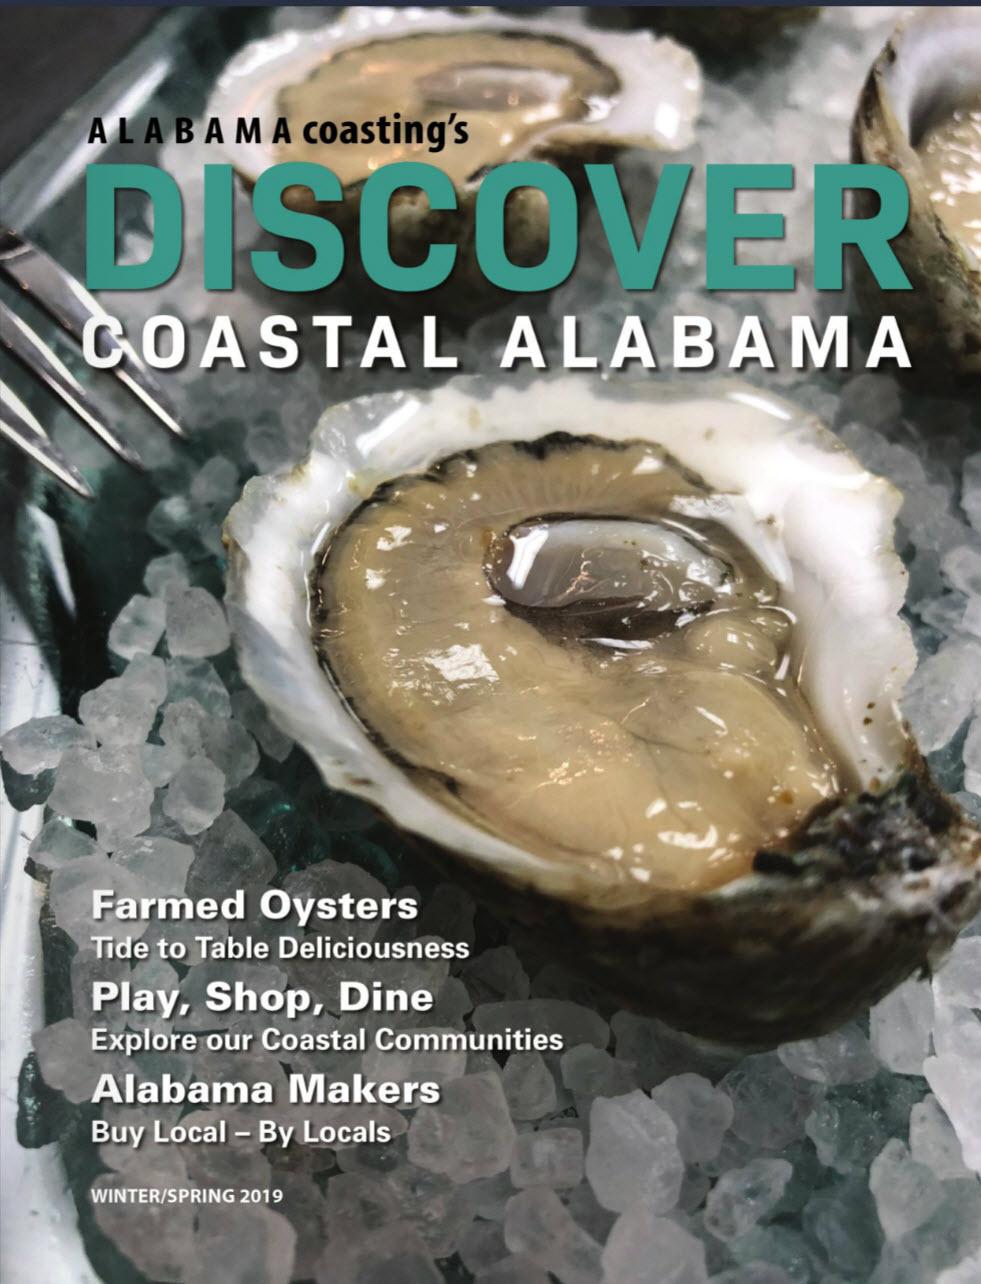 Alabama Coasting Magazine Winter/Spring 2019